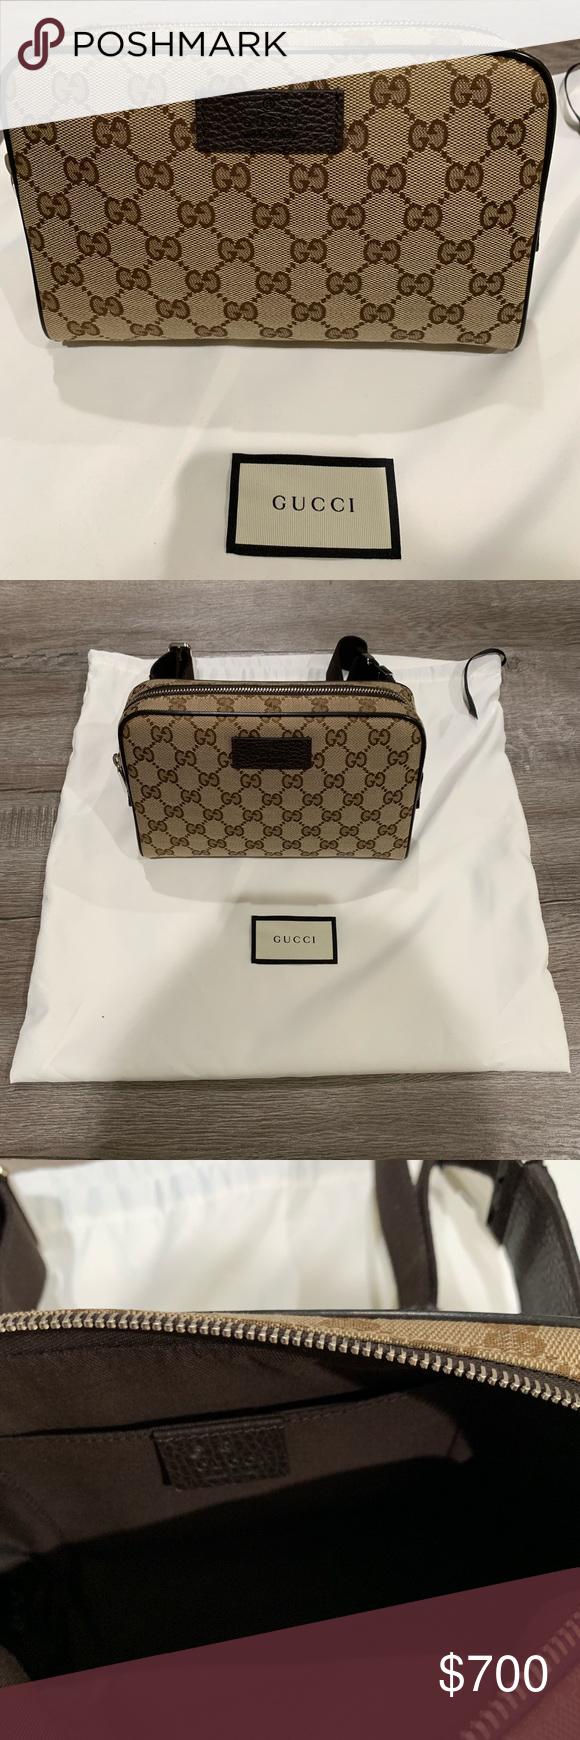 b562d224afd Gucci Guccisima Canvas Waist Belt Fanny Bag NEW Style 449174 (Waist Pack)  Beige Canvas